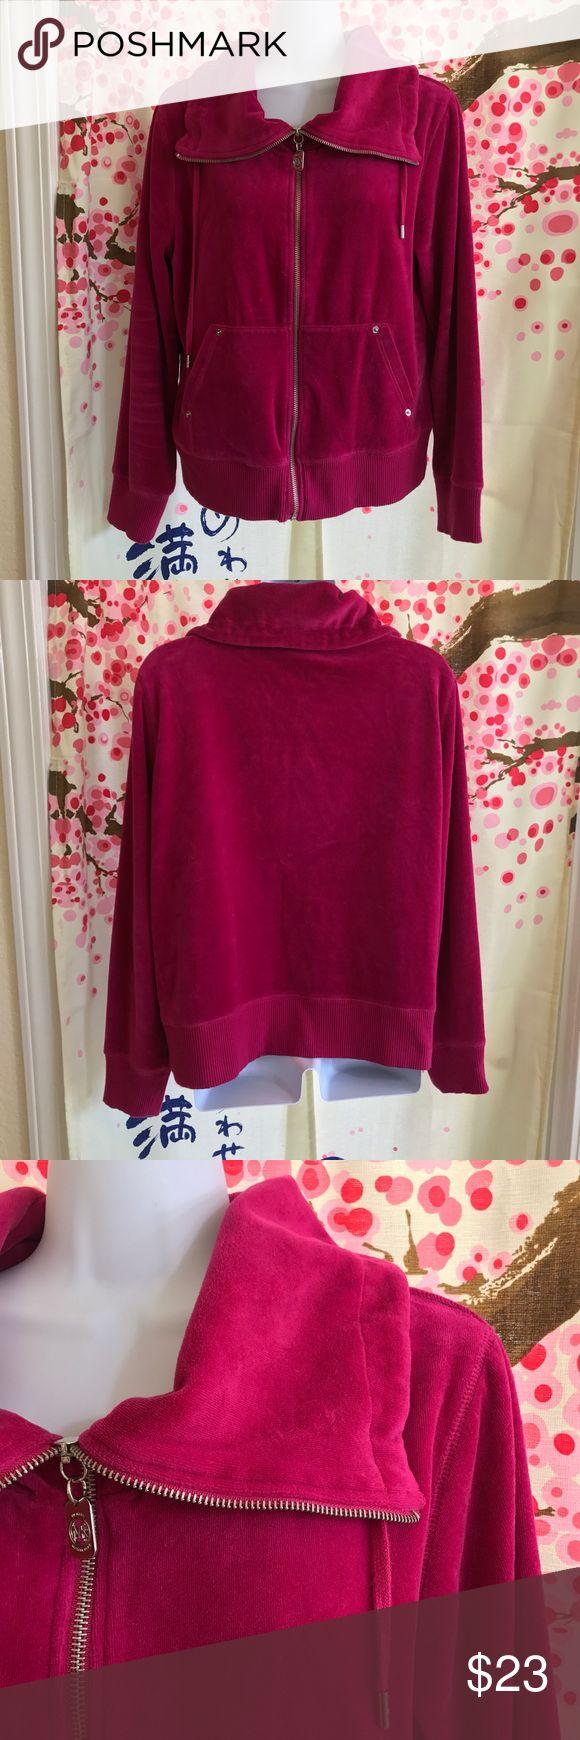 MK velour jacket (binU) GUC Bright pink MK velour jacket size L MICHAEL Michael Kors Jackets & Coats